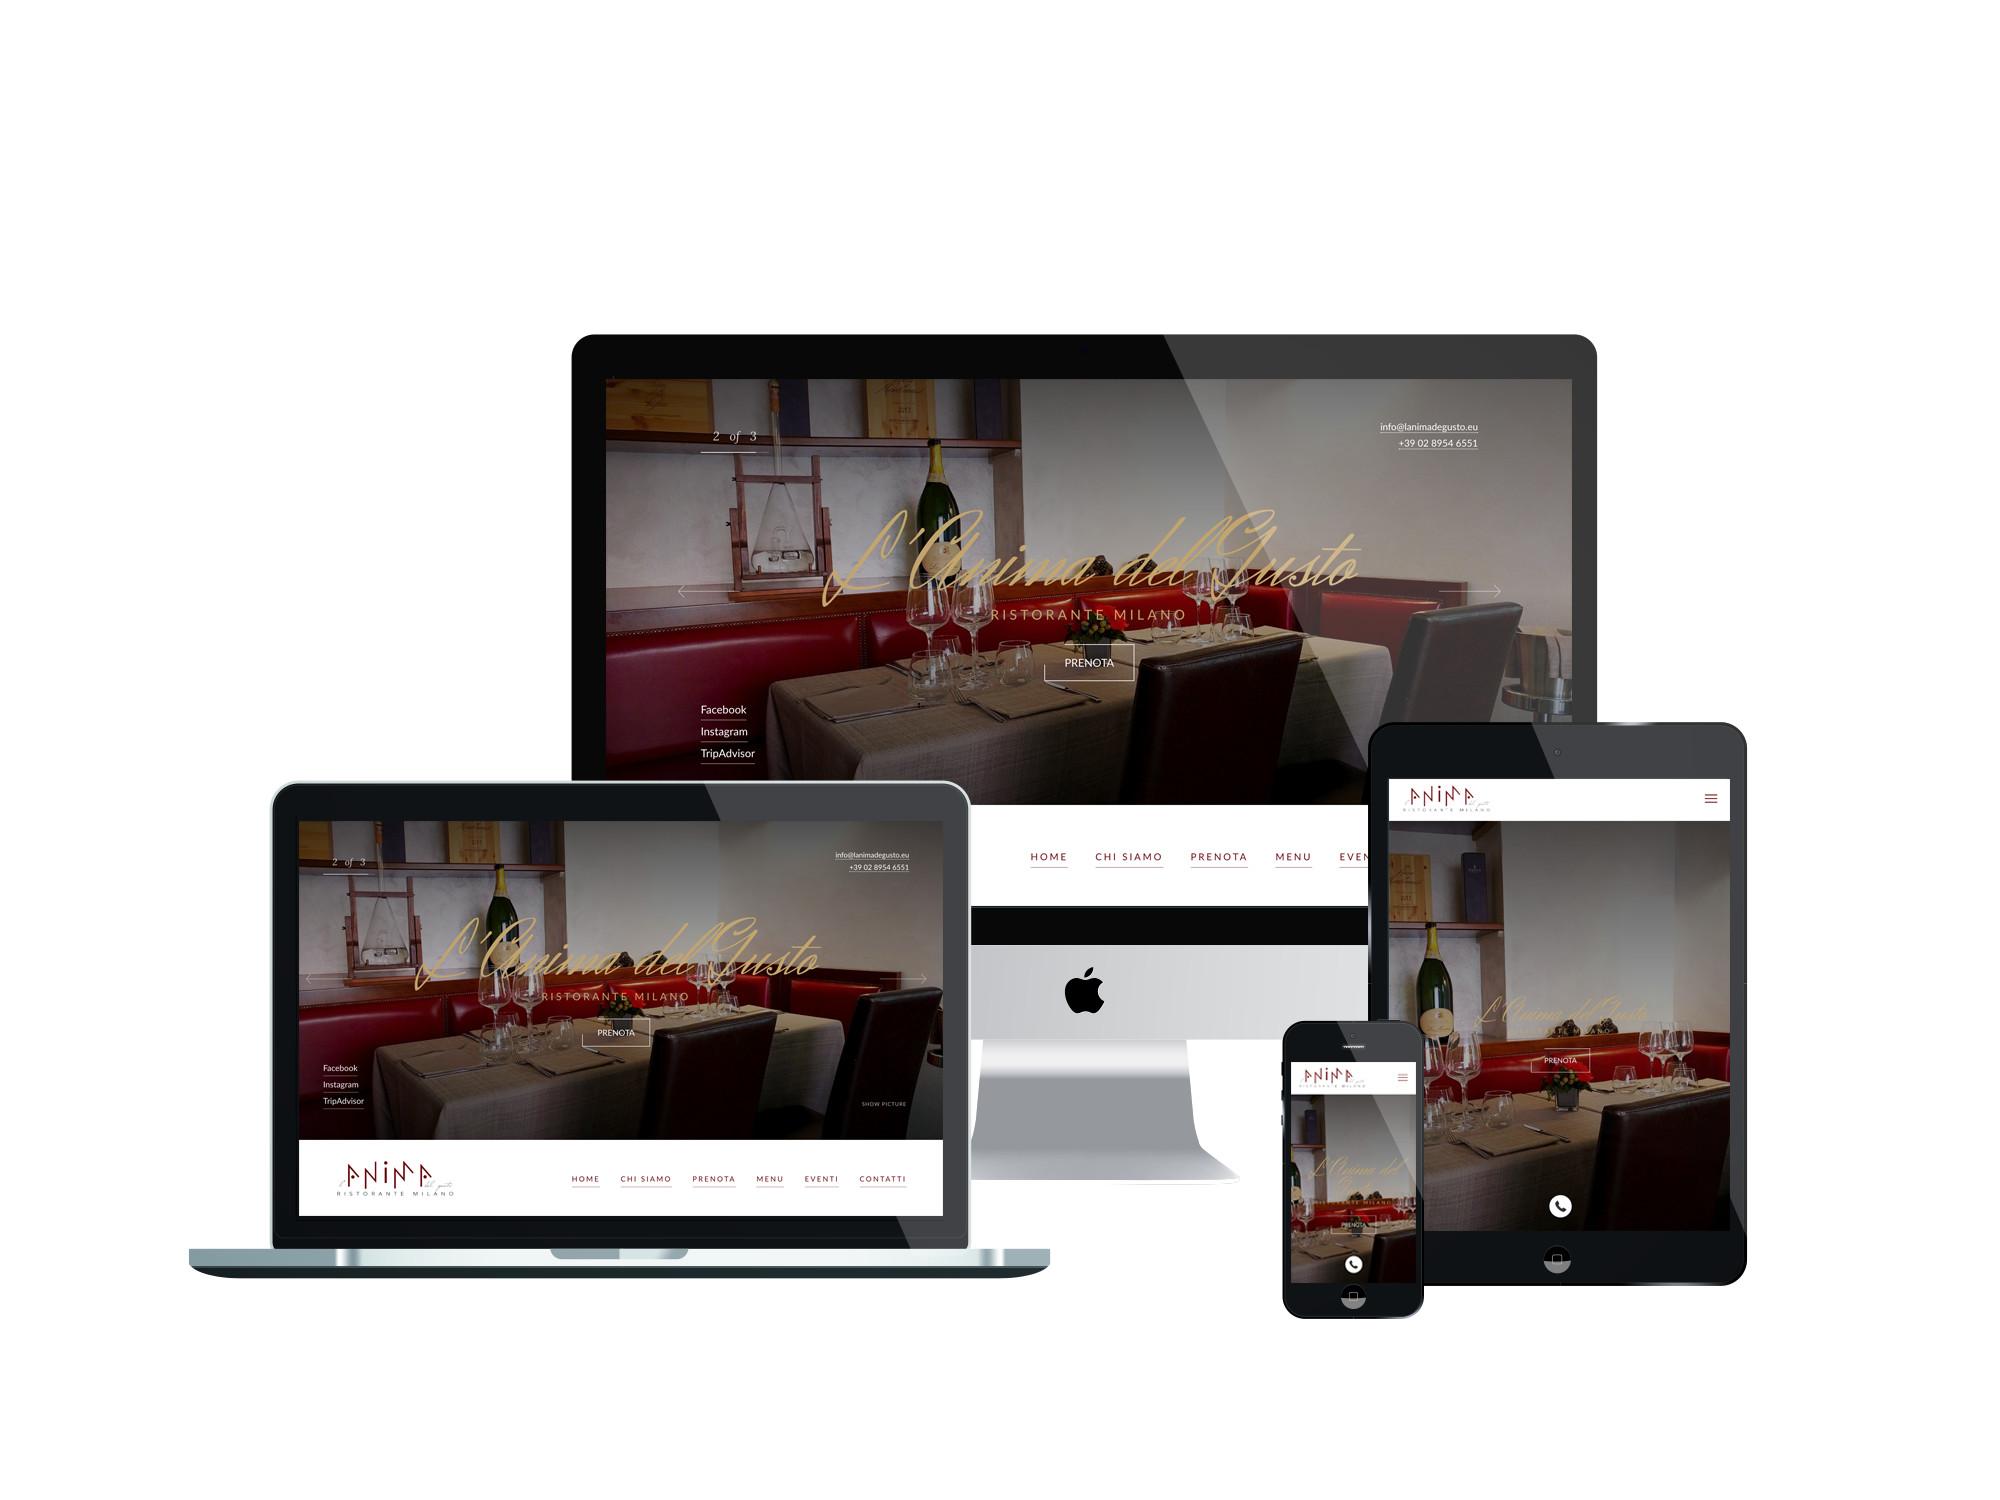 Web designer milano webtraxlab web designer milano for Web designer milano